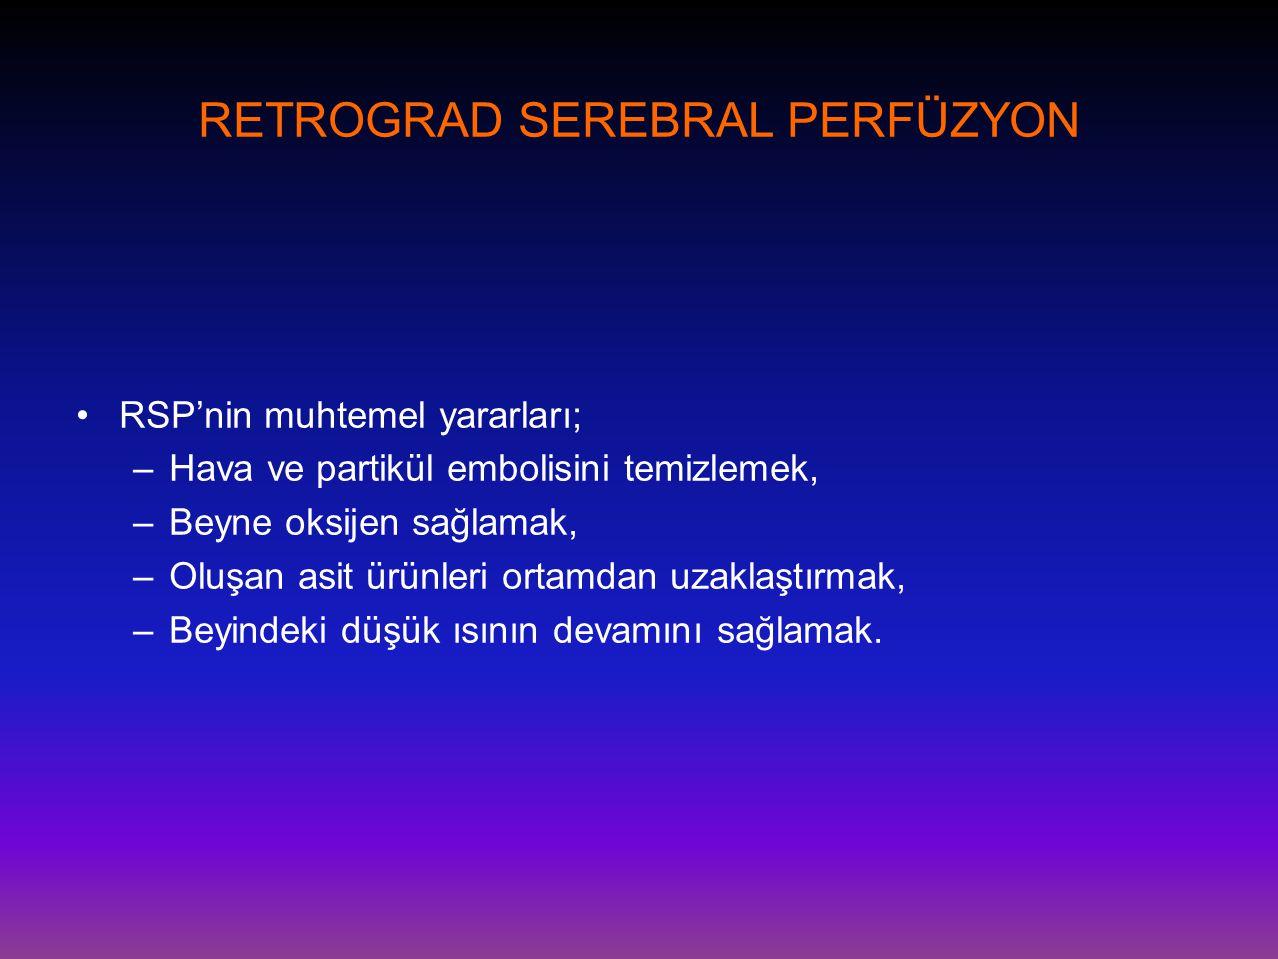 RETROGRAD SEREBRAL PERFÜZYON